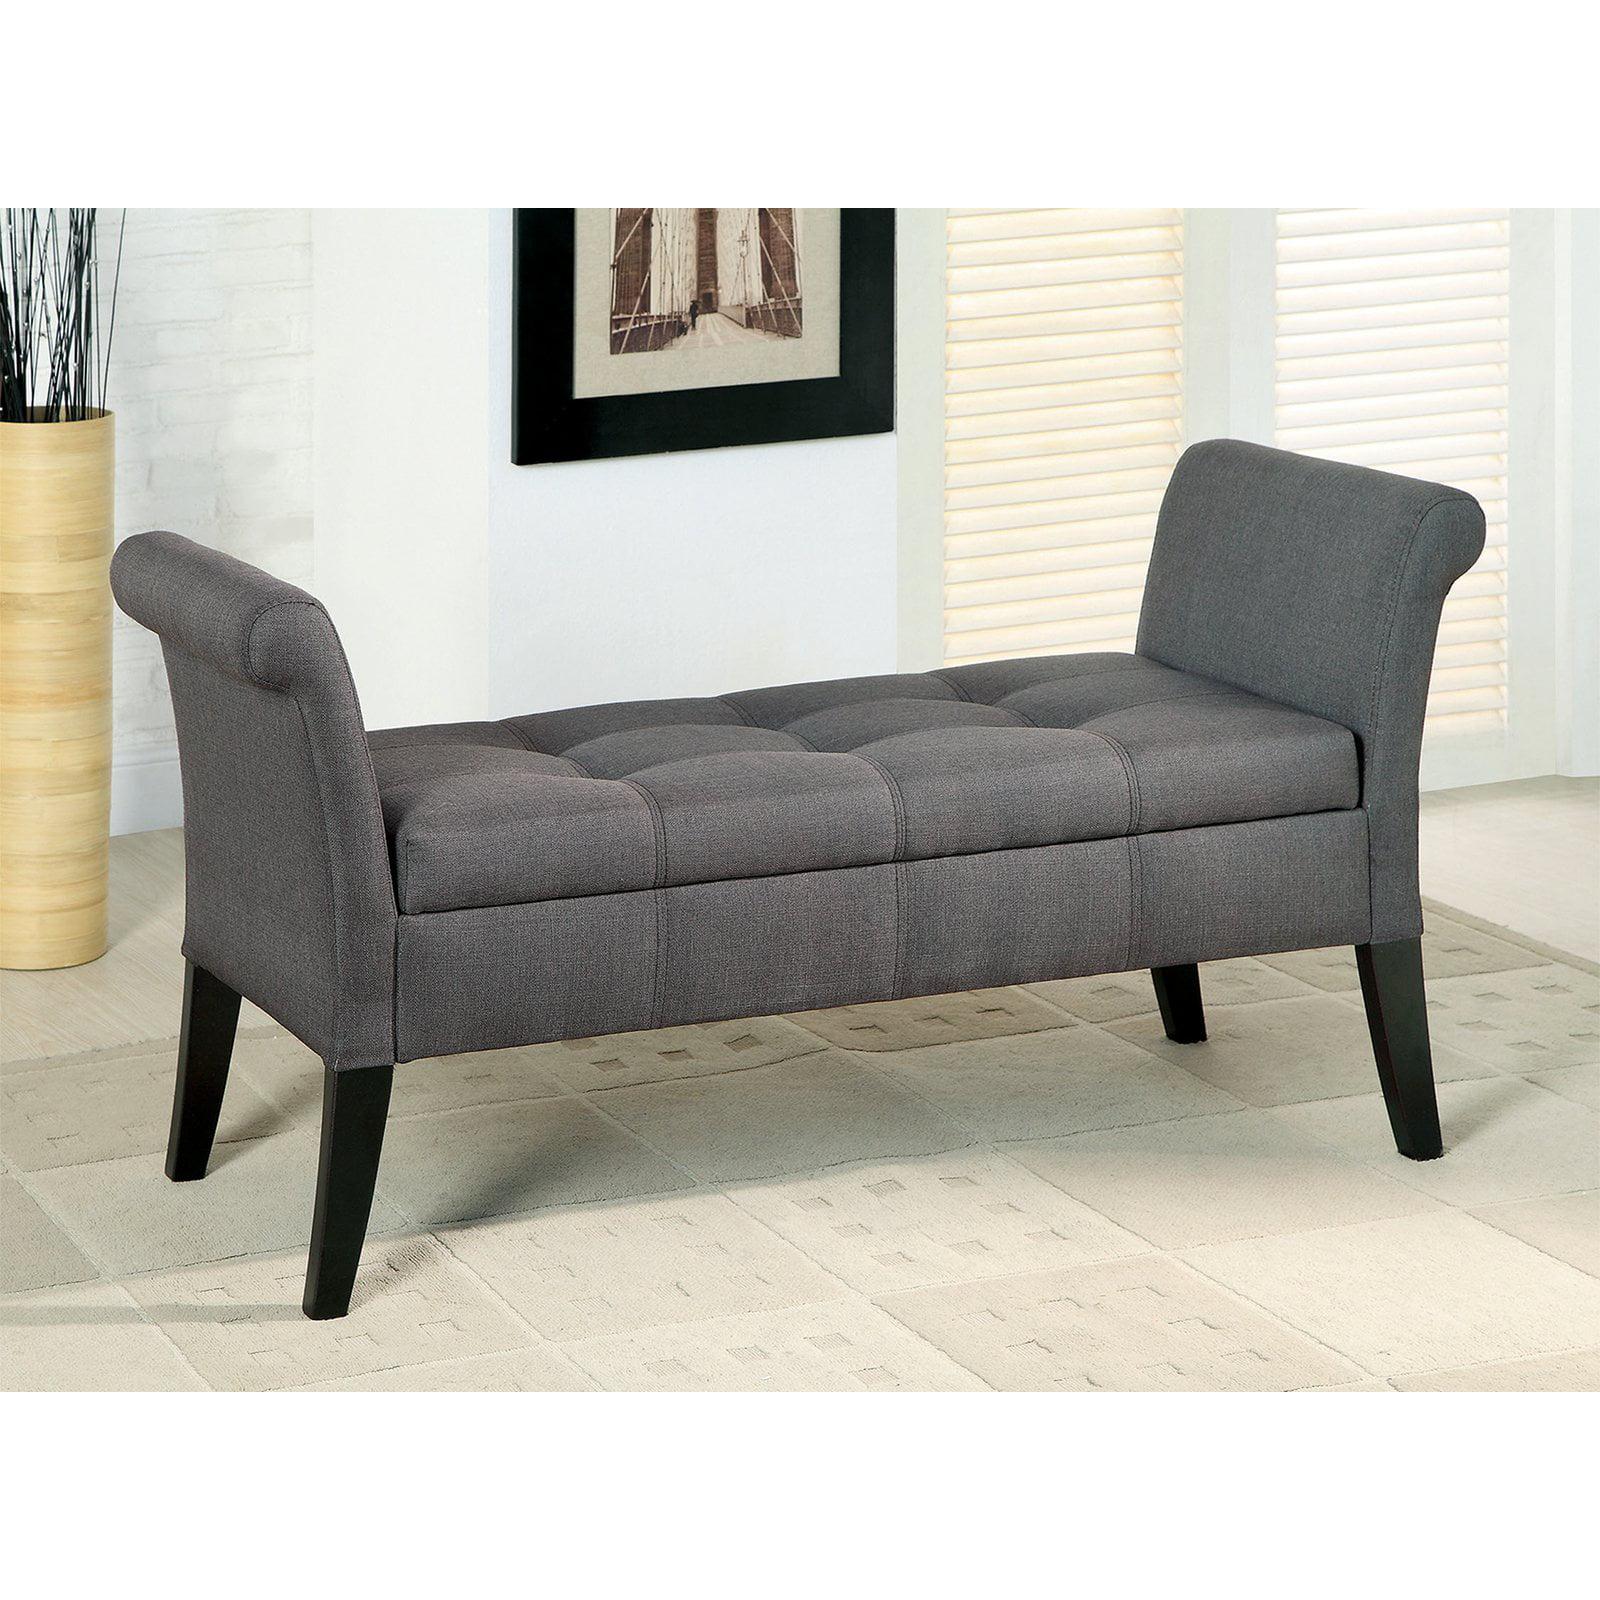 Elegant Furniture Of America Alistar Fabric Upholstered Storage Accent Bench    Walmart.com